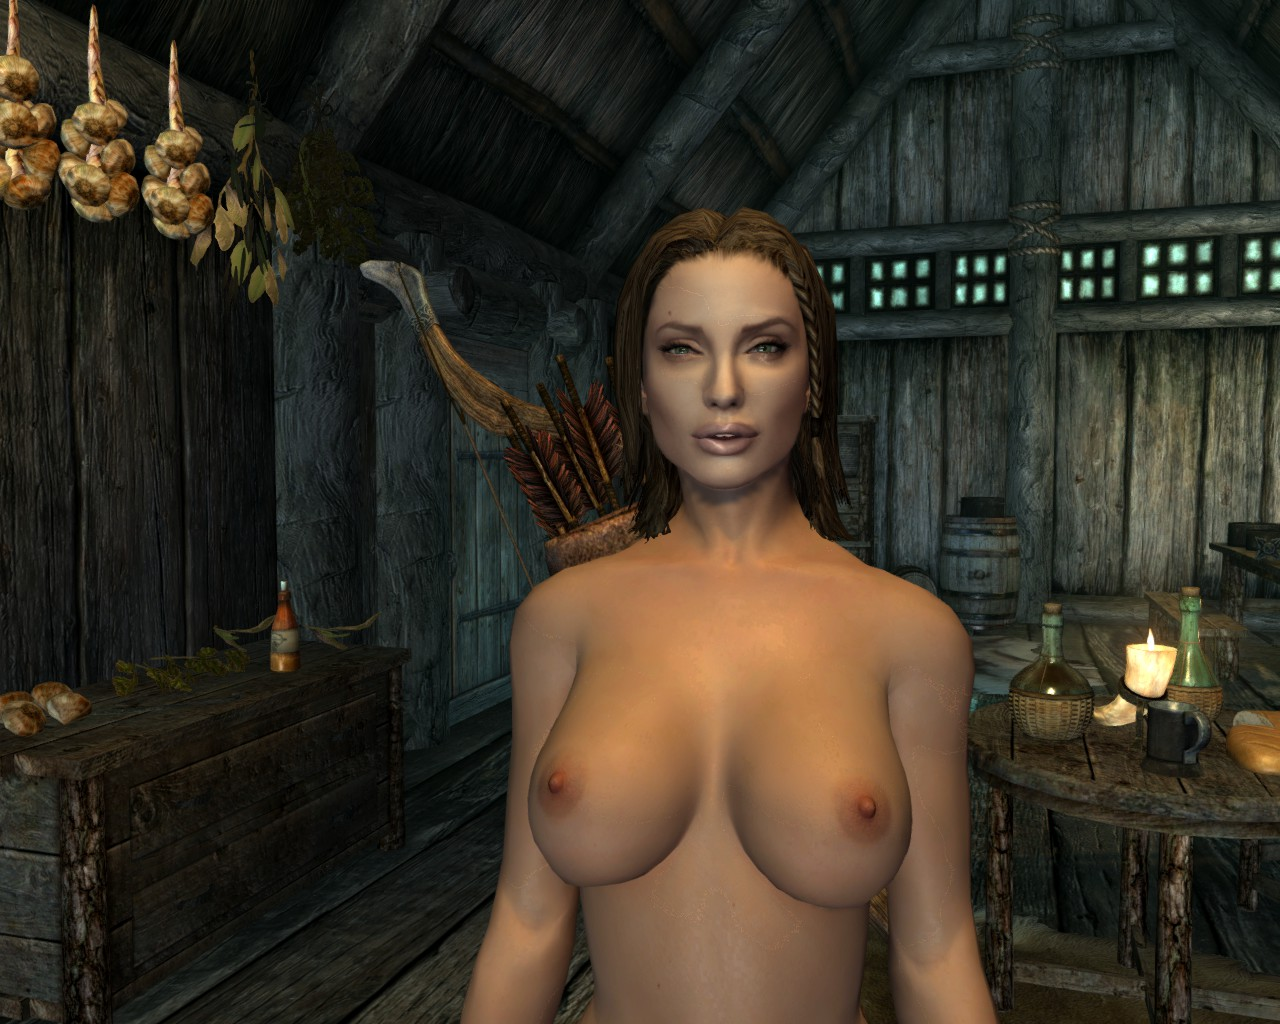 shamita shetty real nude images